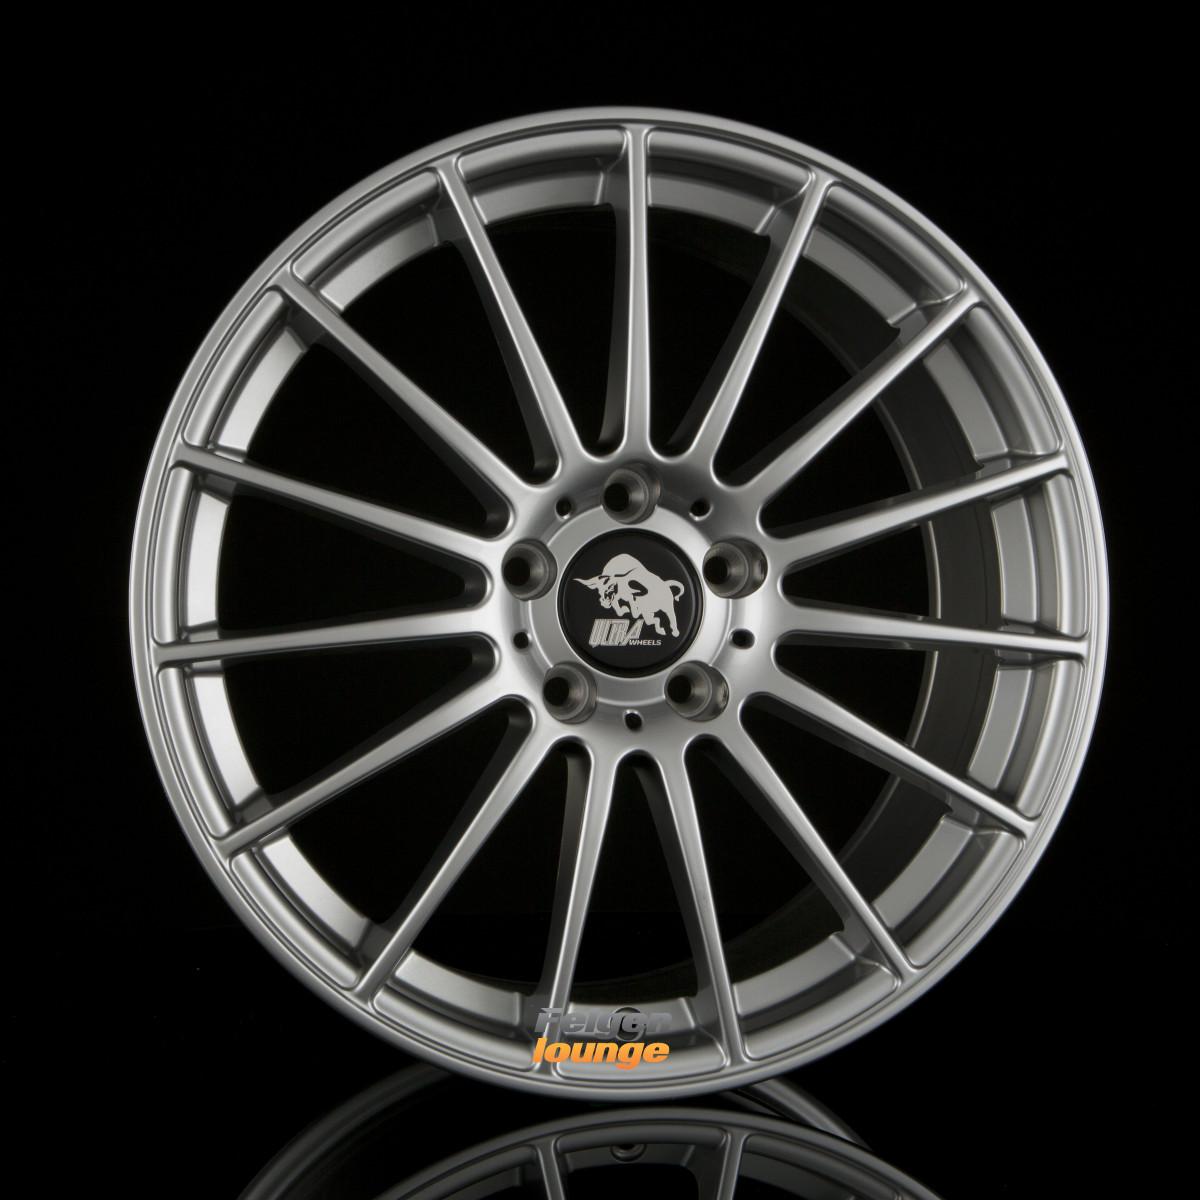 4 alufelgen ultra wheels ua4 speed titan 8x18 et48 5x112. Black Bedroom Furniture Sets. Home Design Ideas